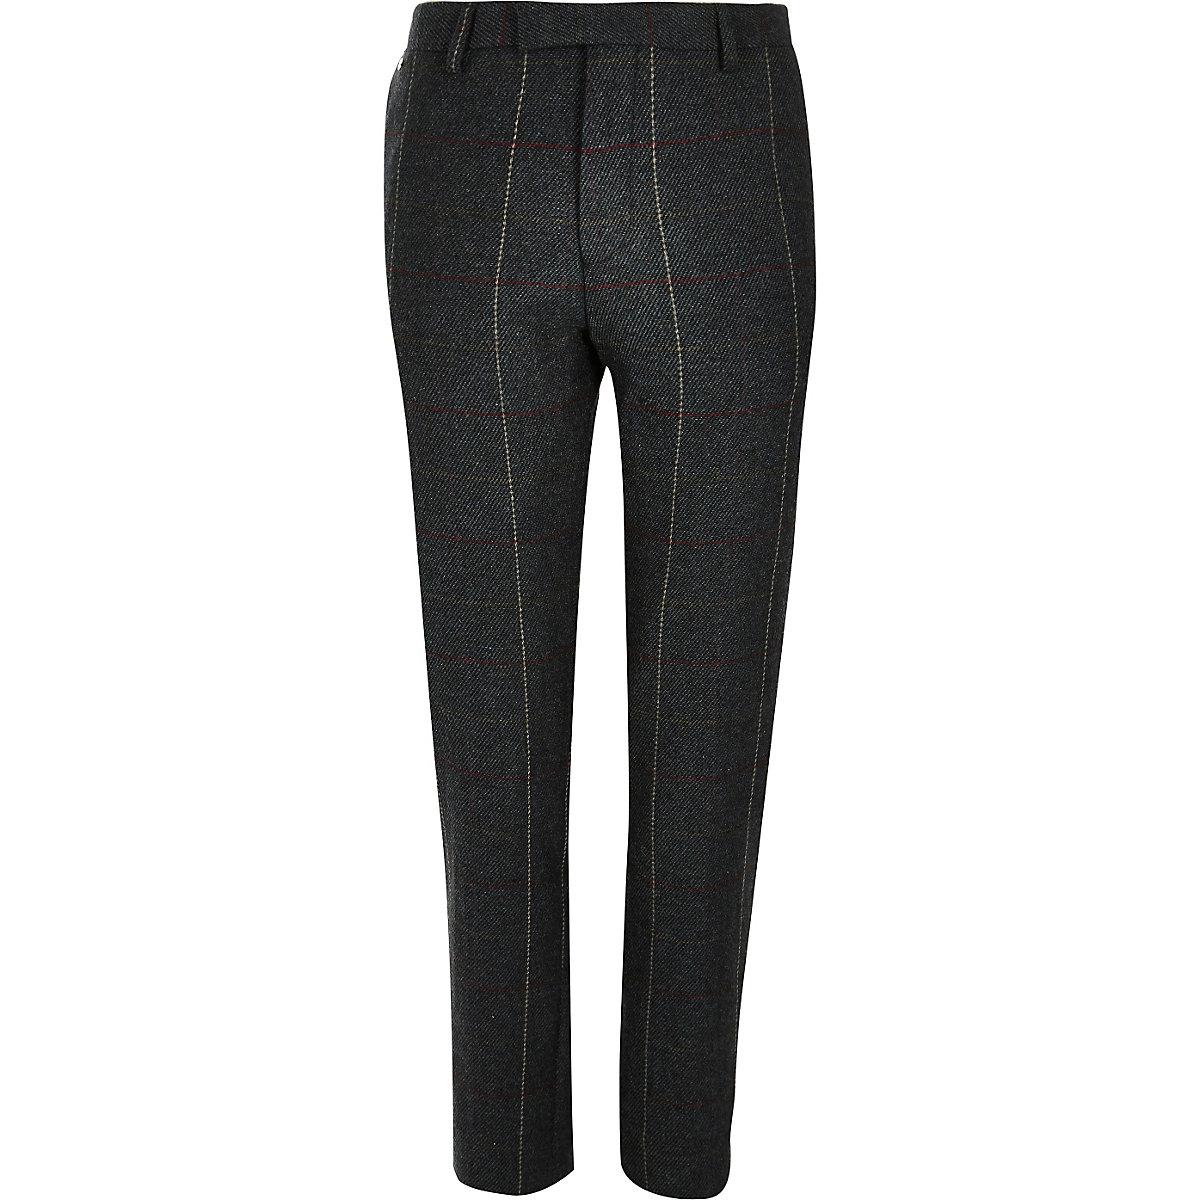 Dark green check skinny suit pants